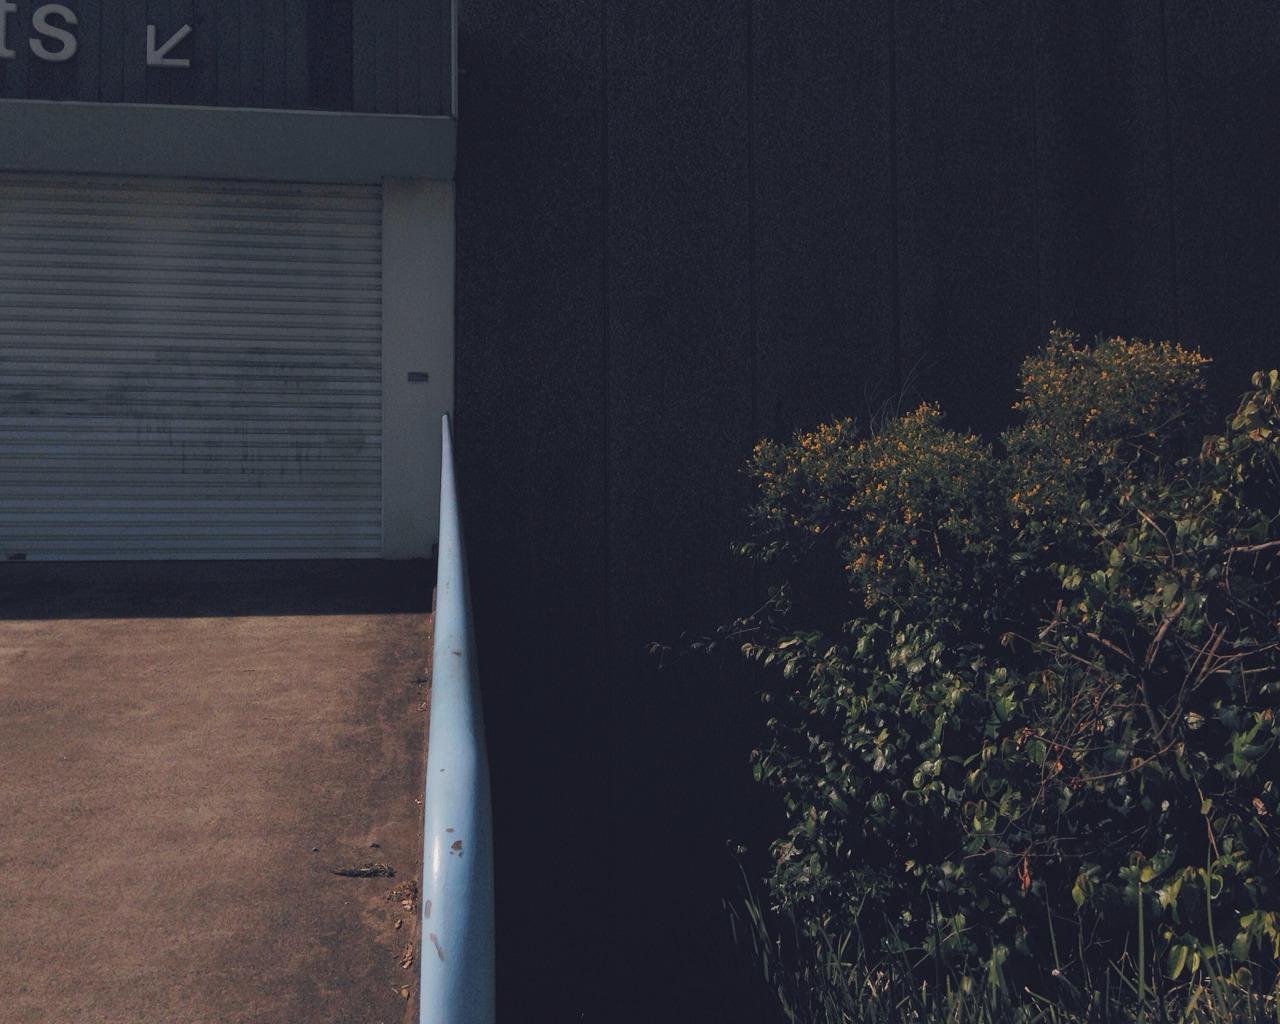 Kareela - 3/5  #suburbia #suburbianviews #urbanlandscape #kareela #documentingspace